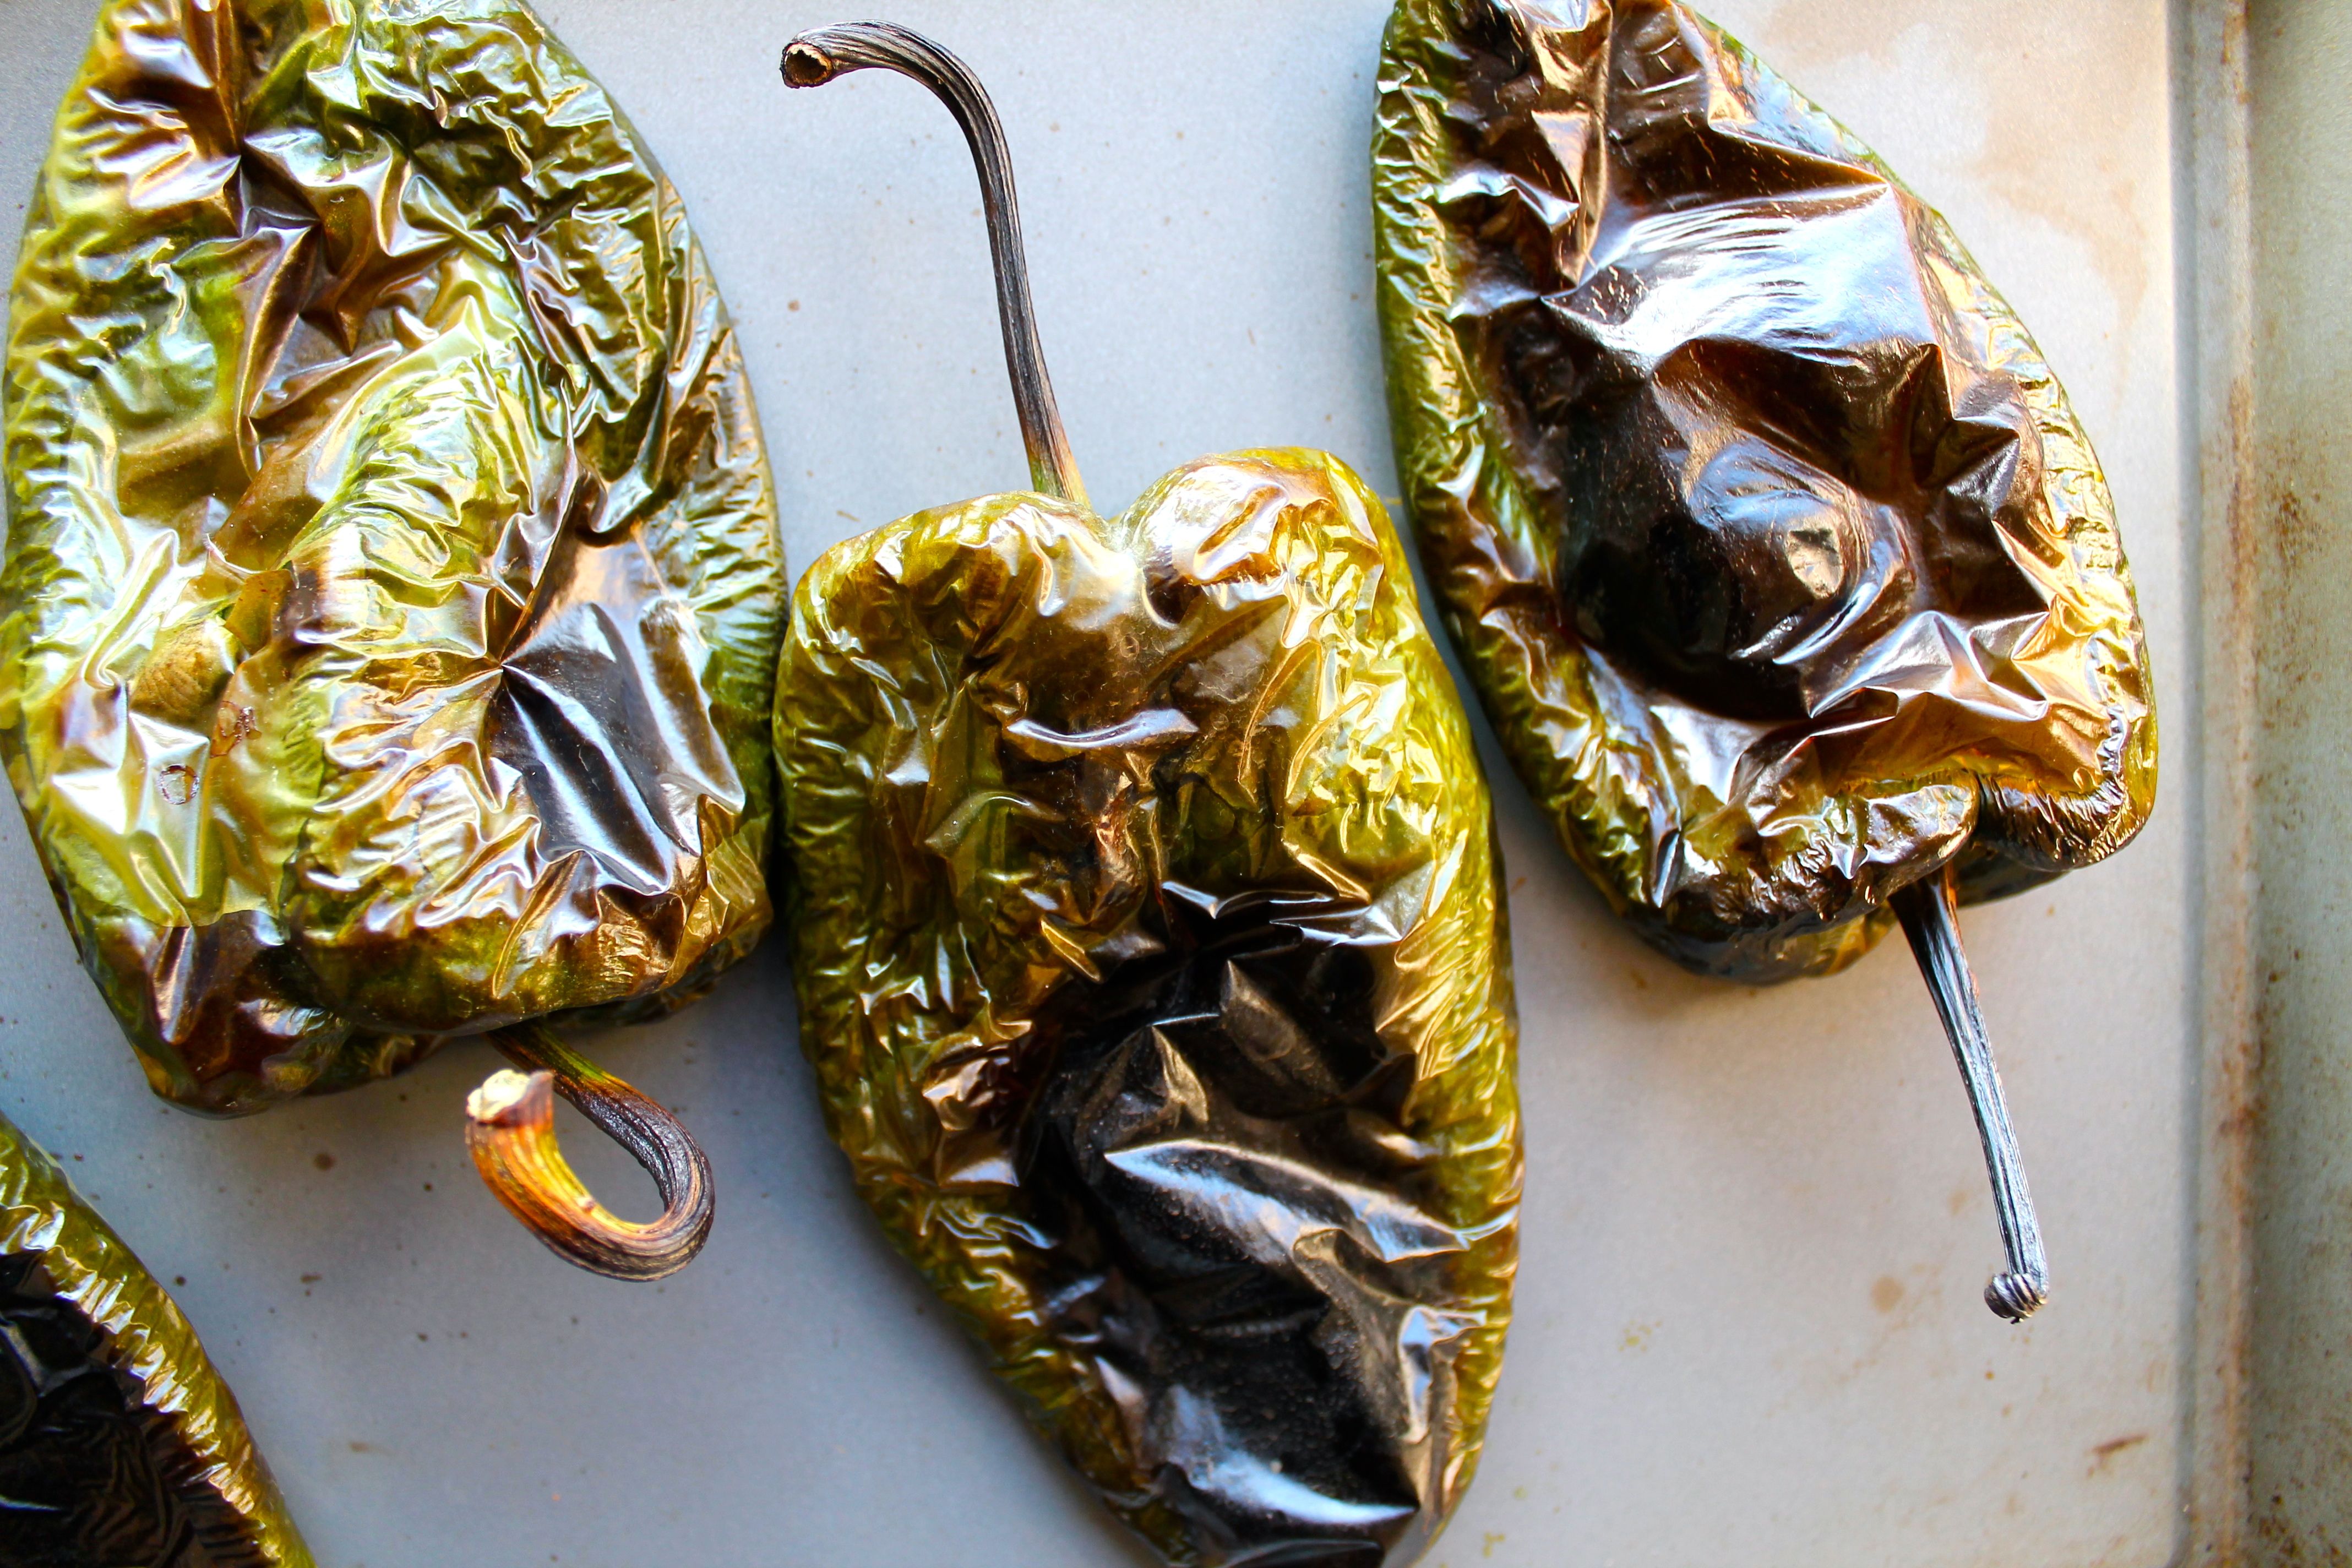 Rajas Poblanas Tacos with Homemade Tortillas, Etc. -